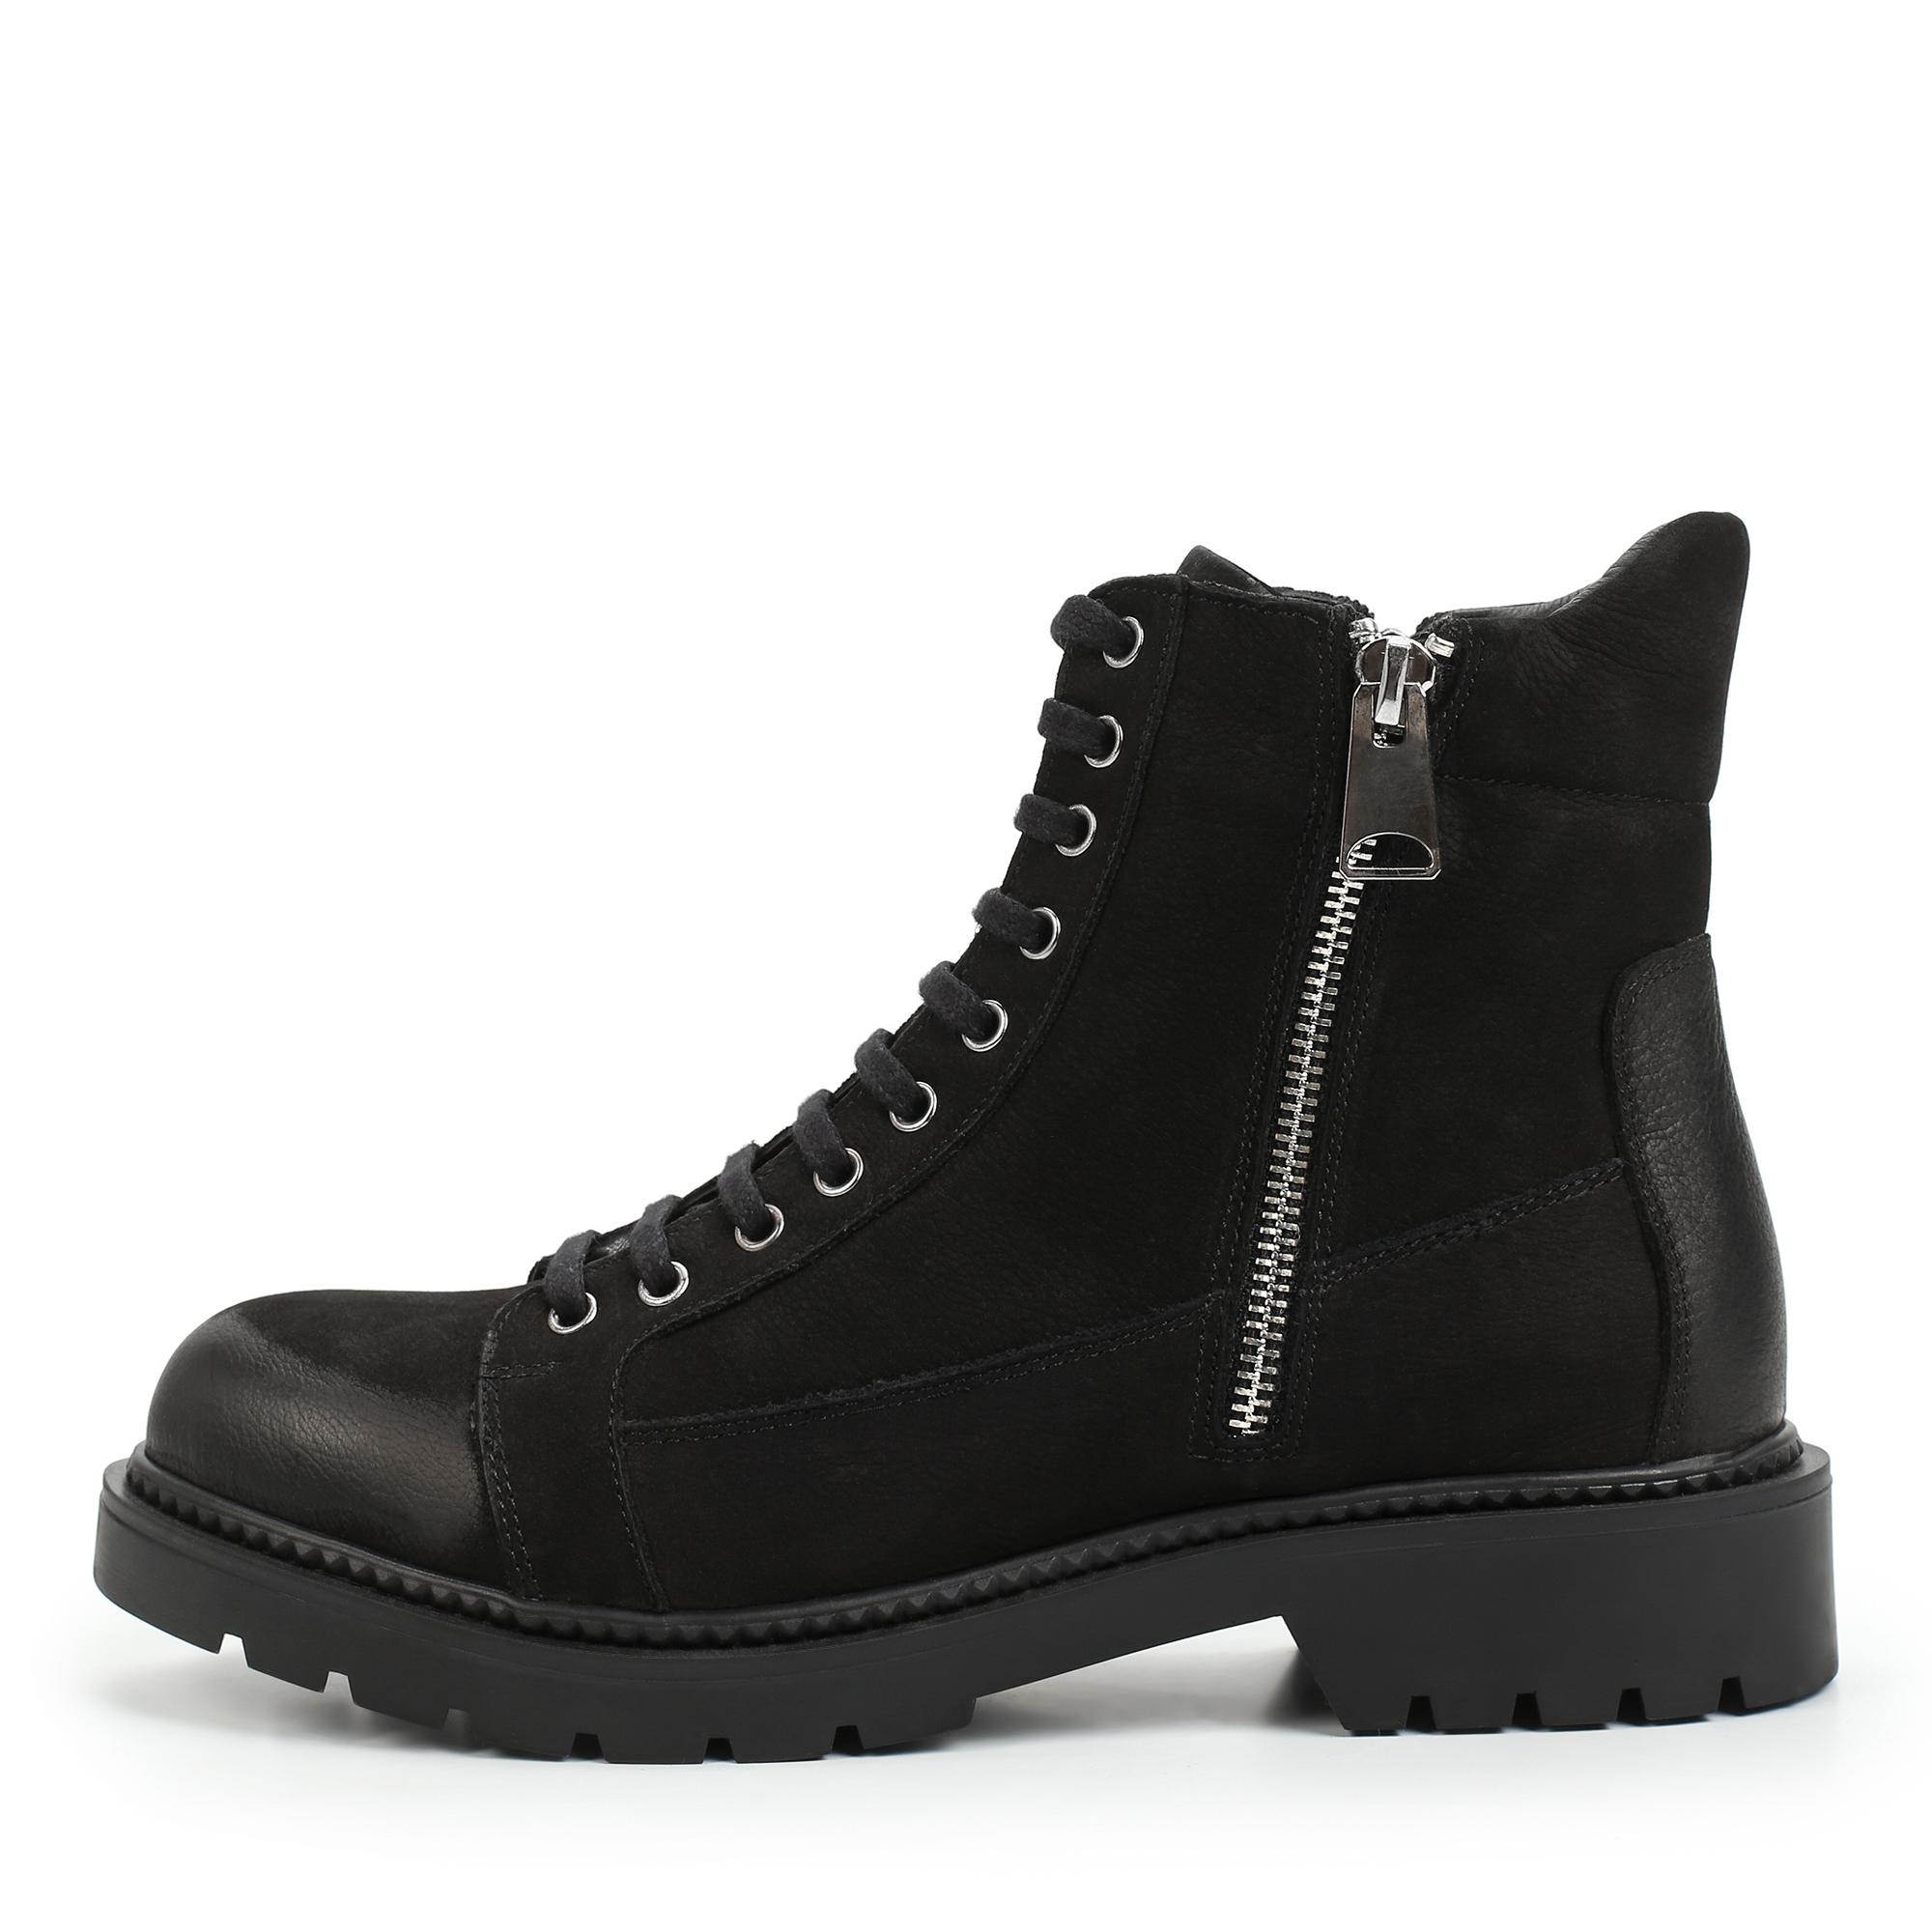 Ботинки Thomas Munz 505-084A-40302